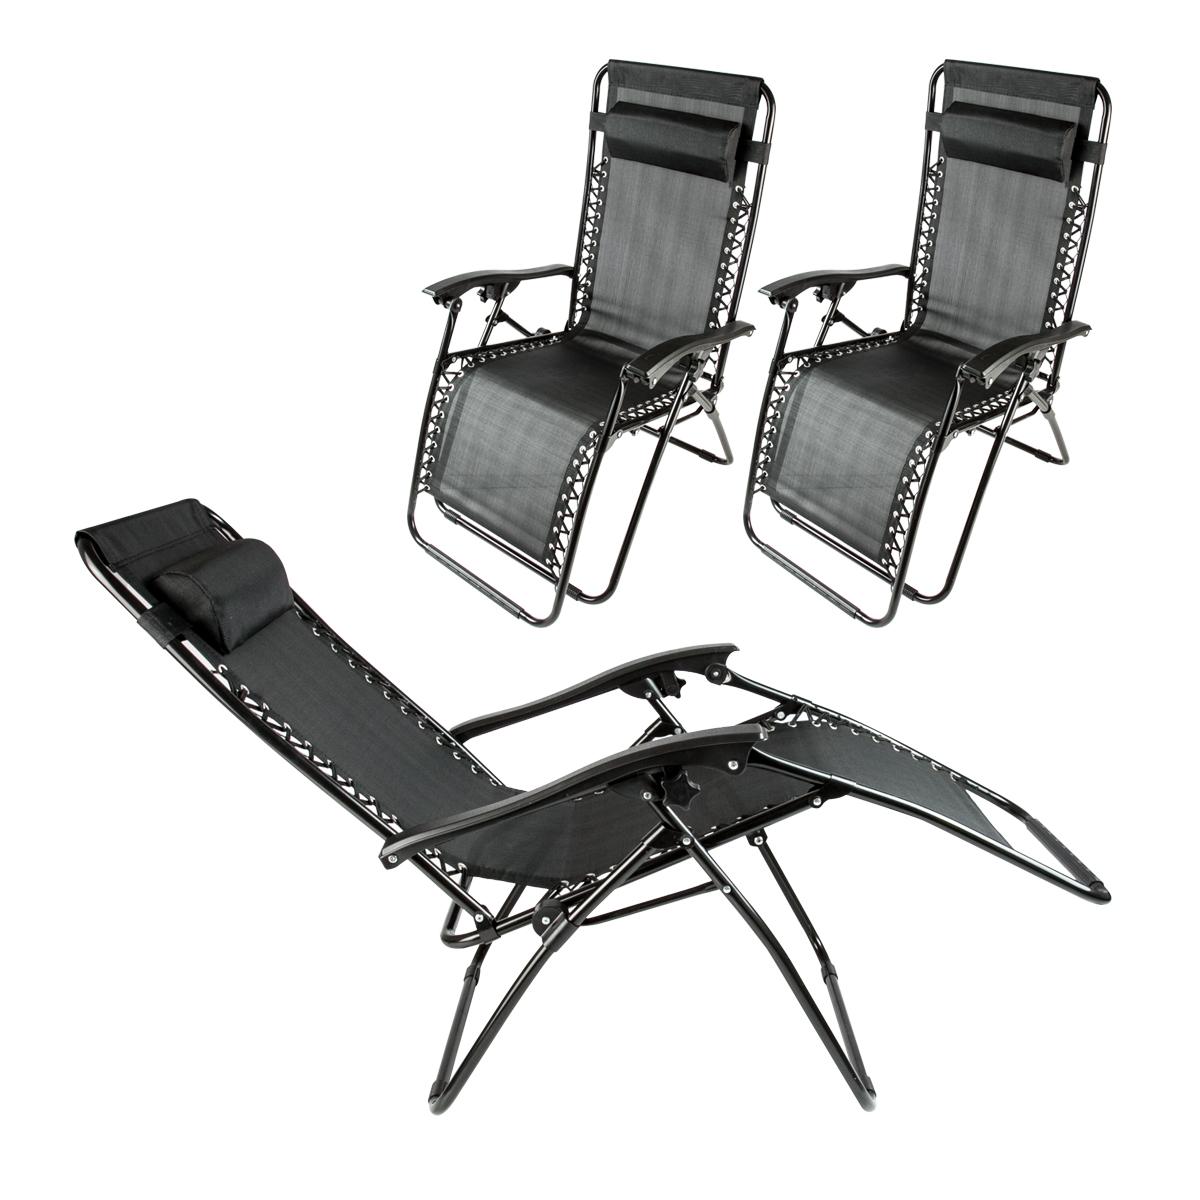 2 Lounge Chairs Zero Gravity Folding Recliner Outdoor Beach Black Patio Pool New